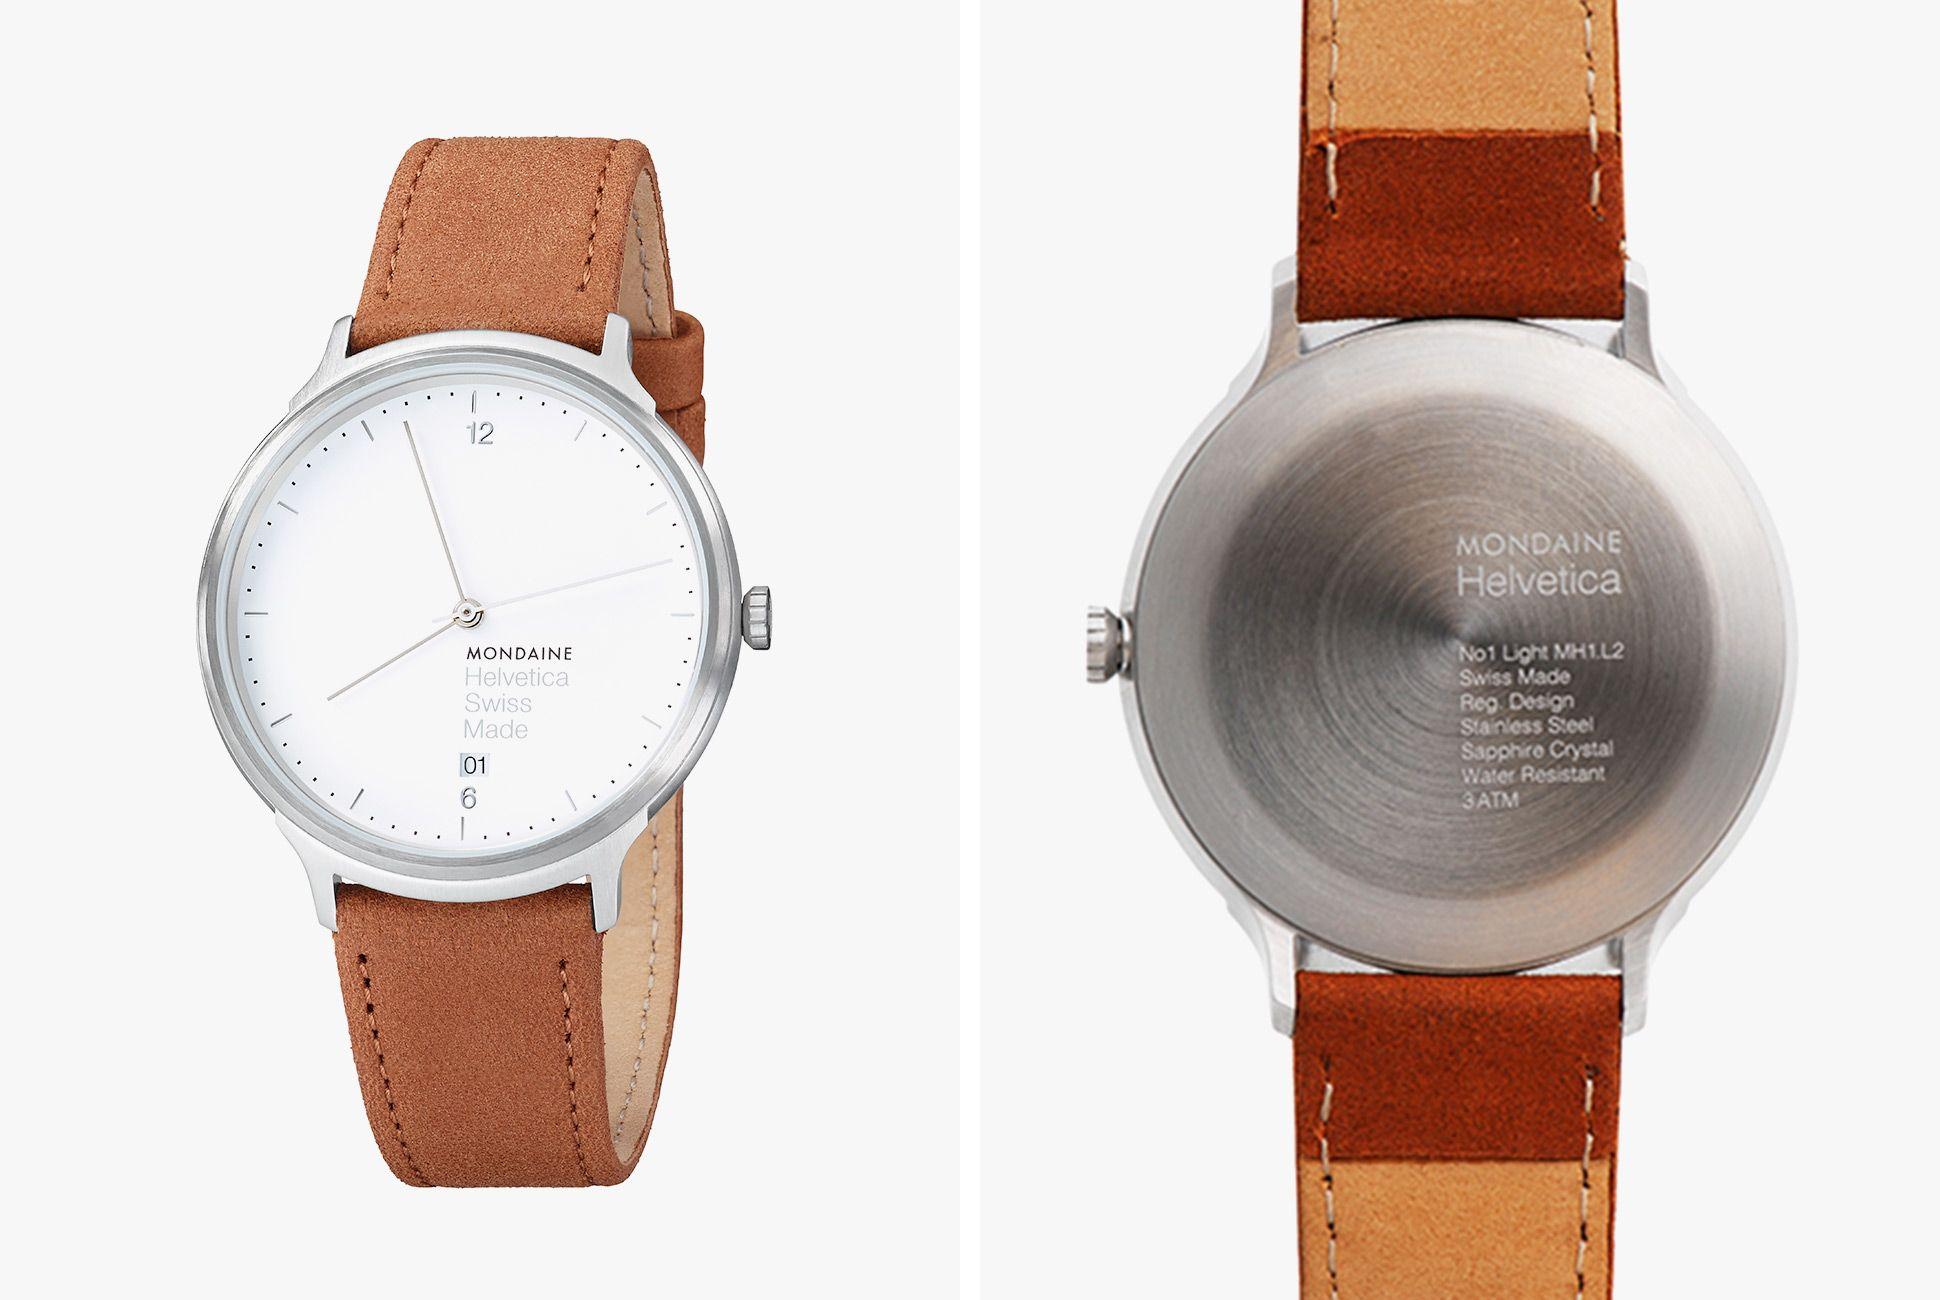 Mondaine-Simple-Watches-Gear-Patrol